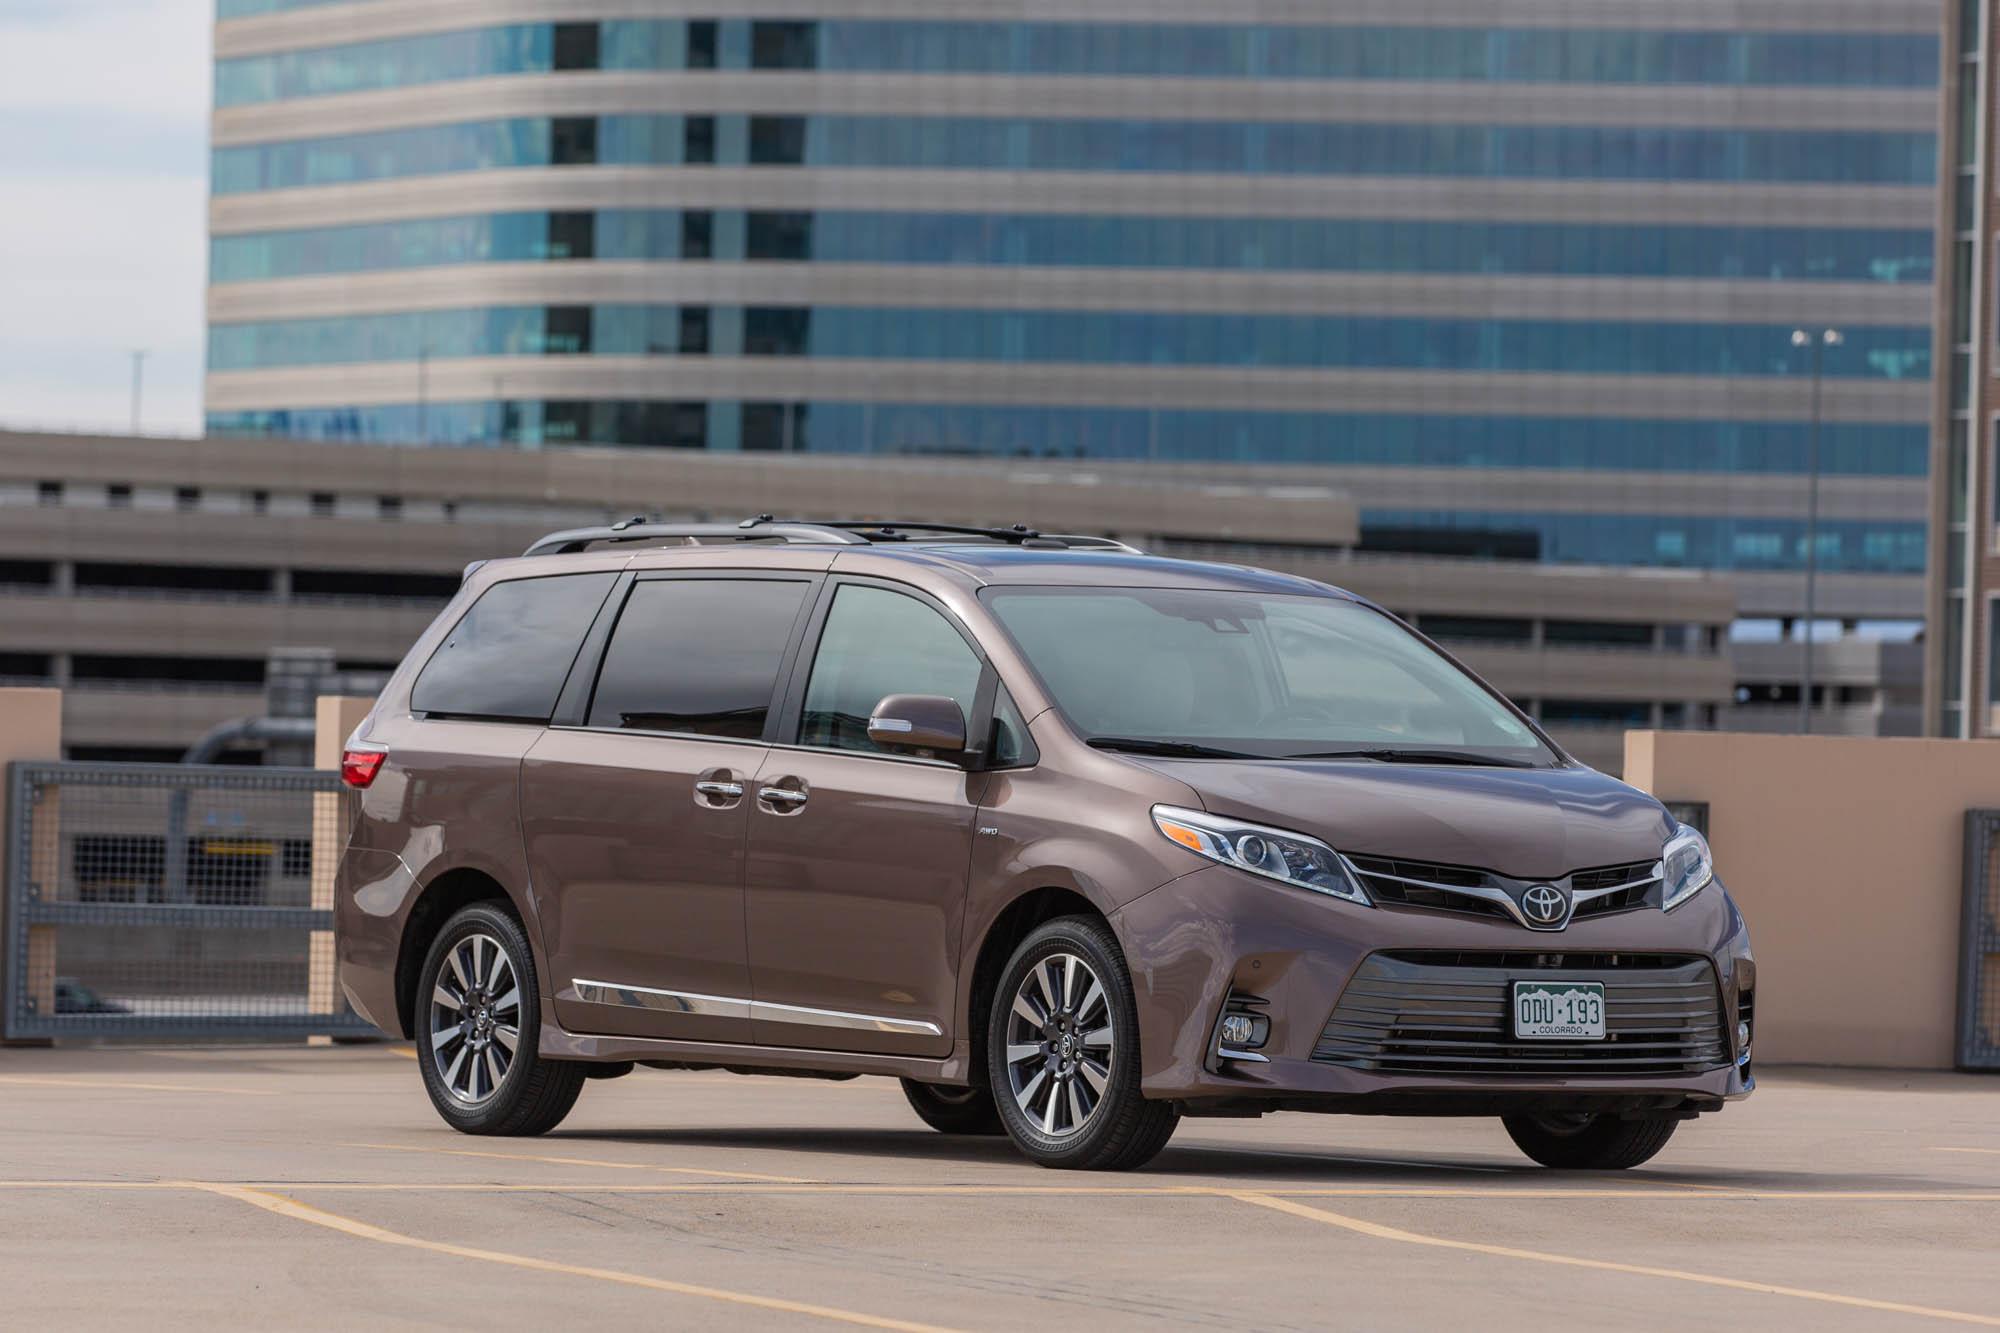 Kelebihan Kekurangan Toyota Premium Harga